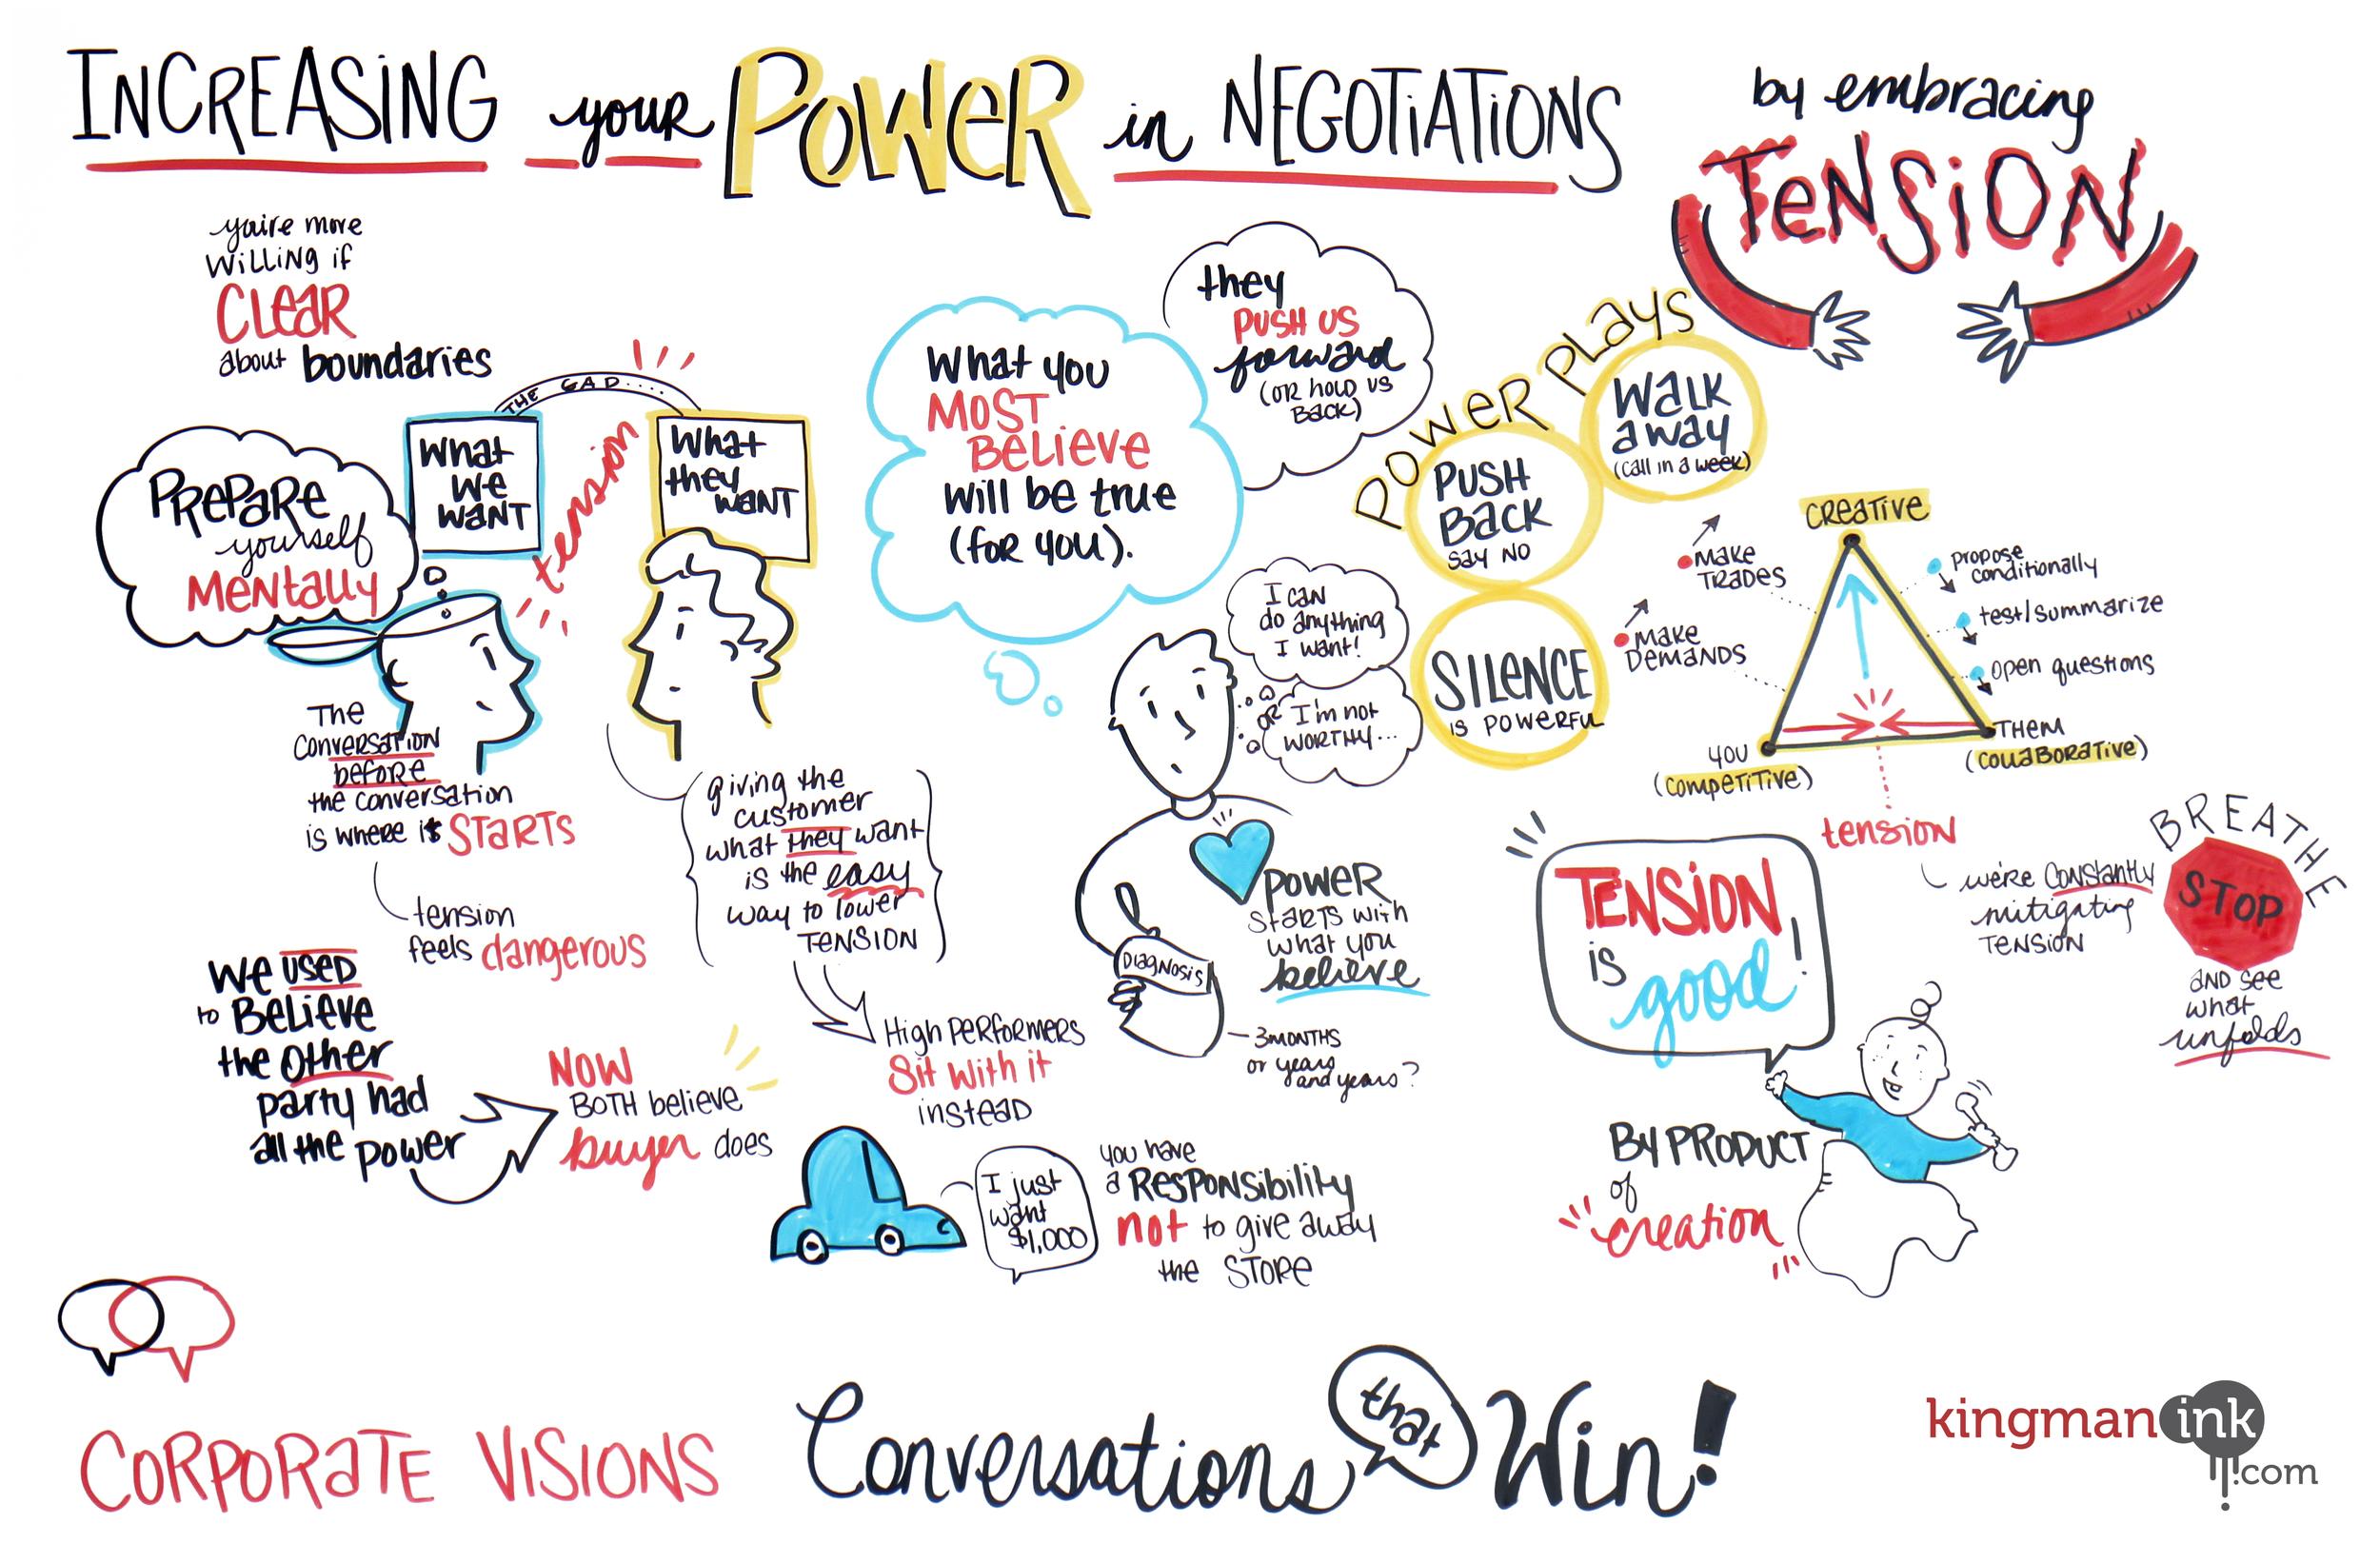 KingmanInk_CorporateVisions_PowerinNegotiations.jpg